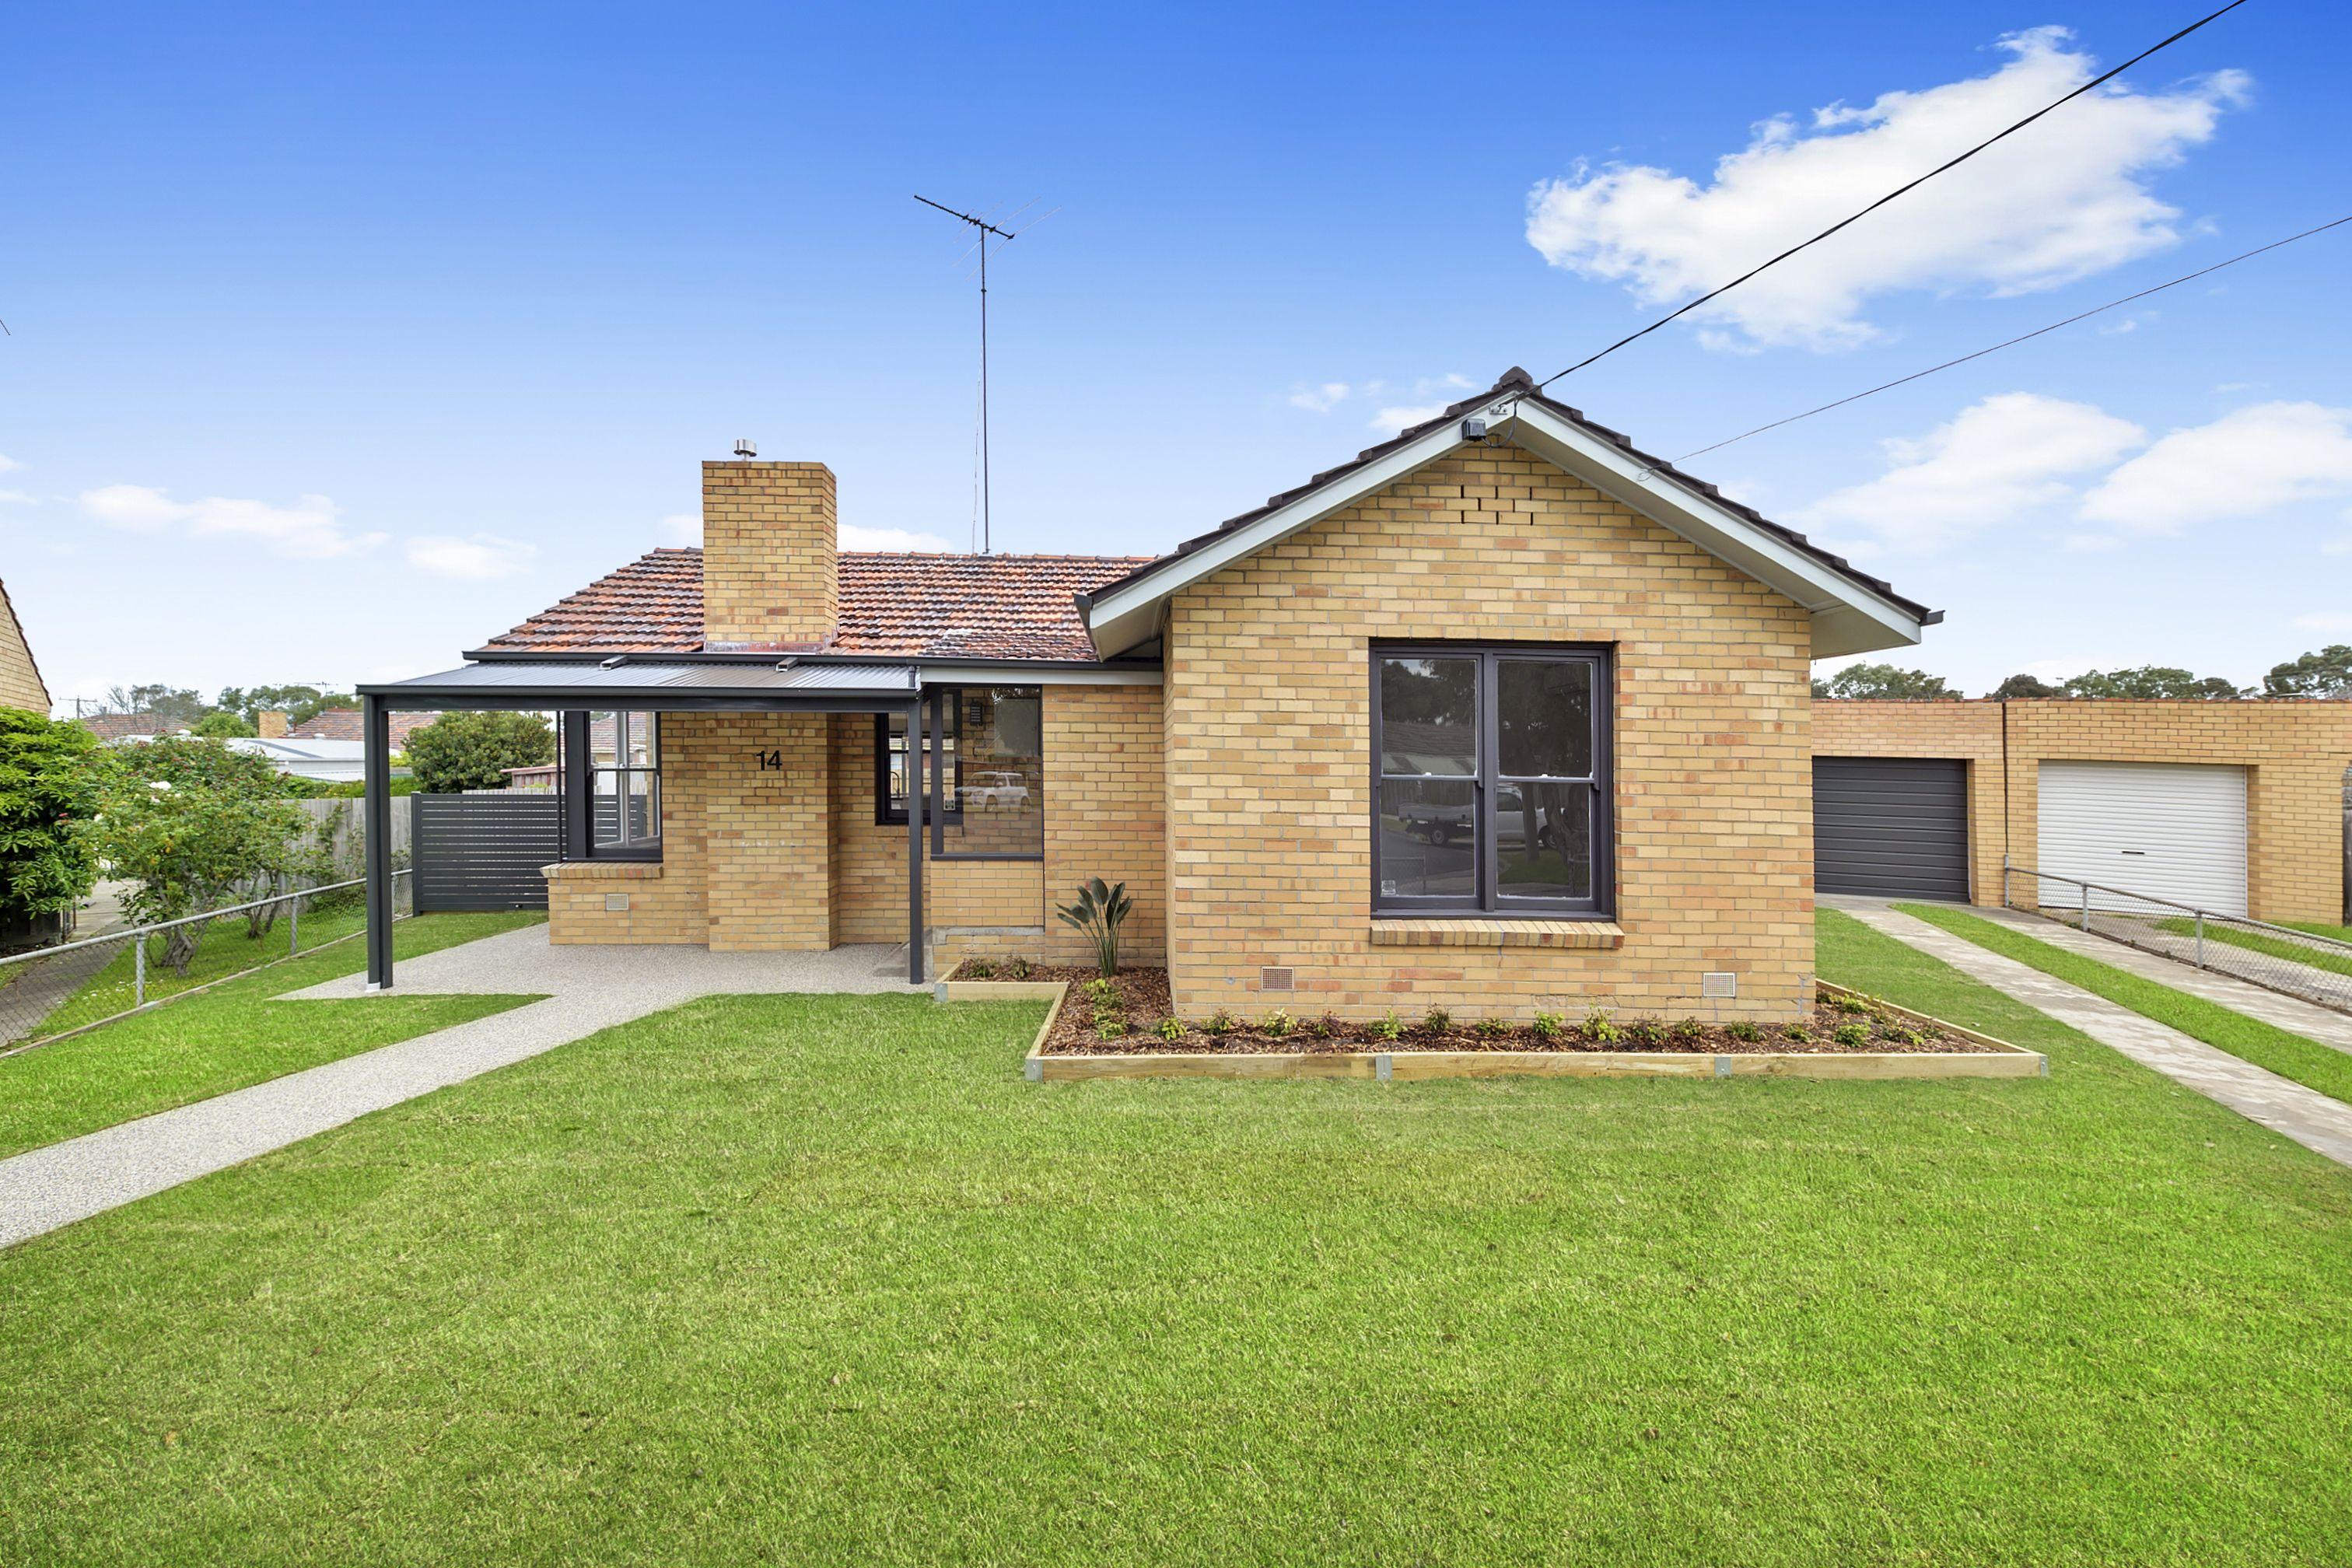 14 Bendle Court</br>East Geelong